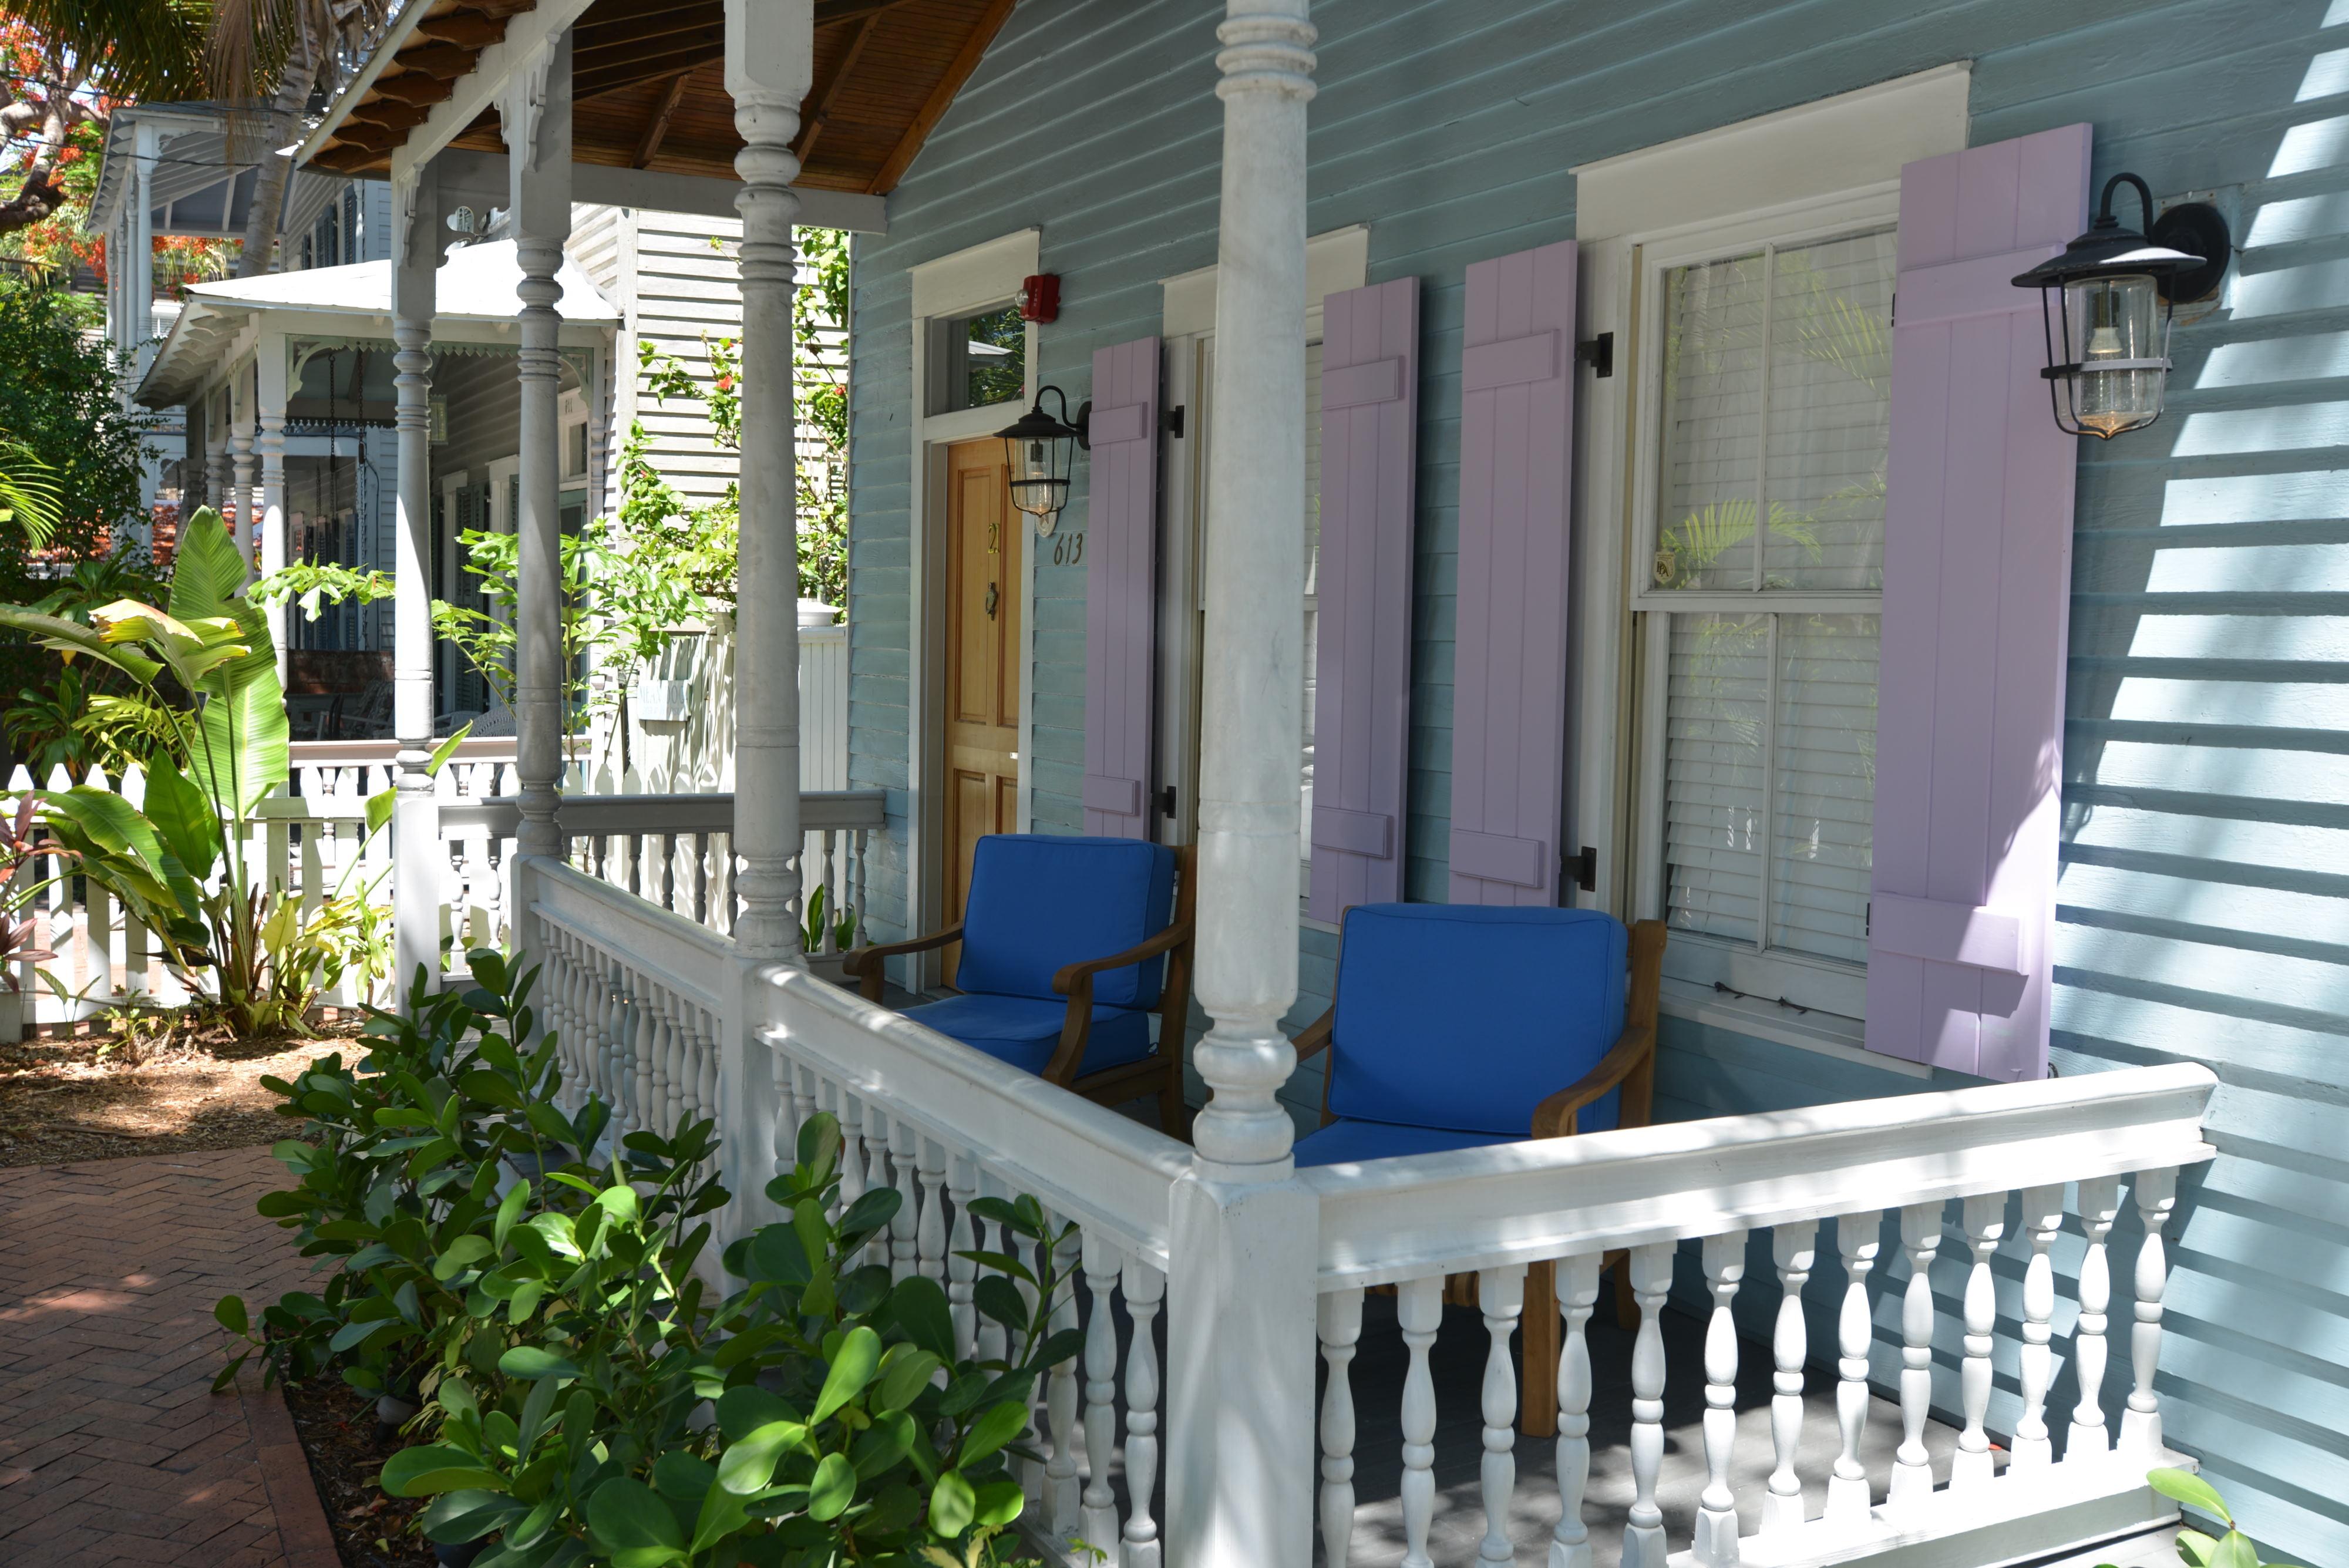 Cypress house hotel in key west key west florida fl for Cypress house